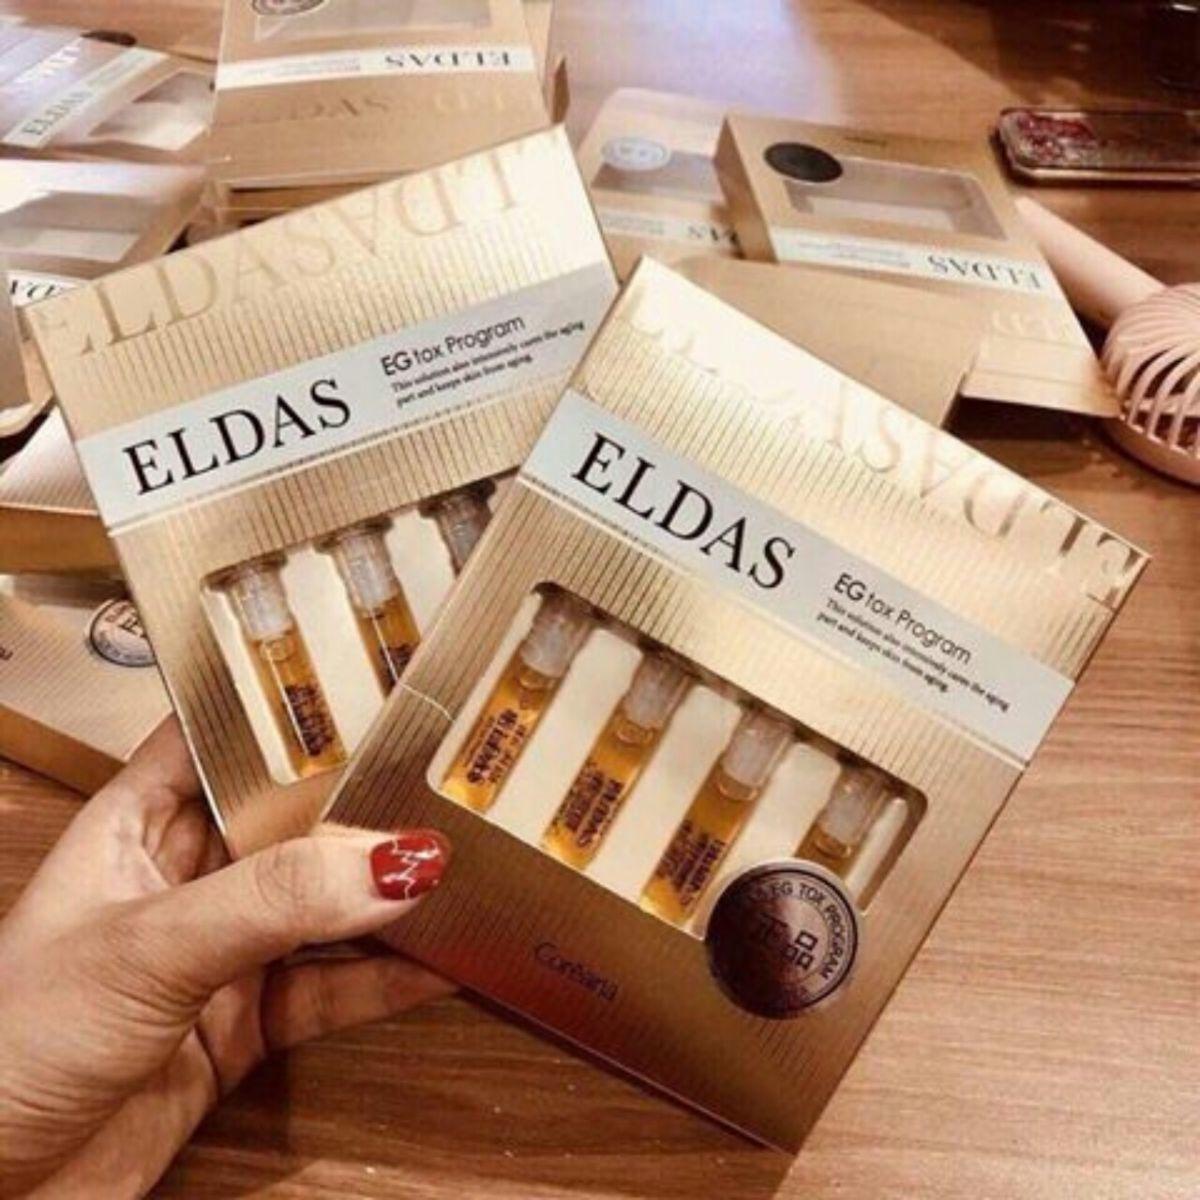 mỹ phẩm tế bào gốc Eldas